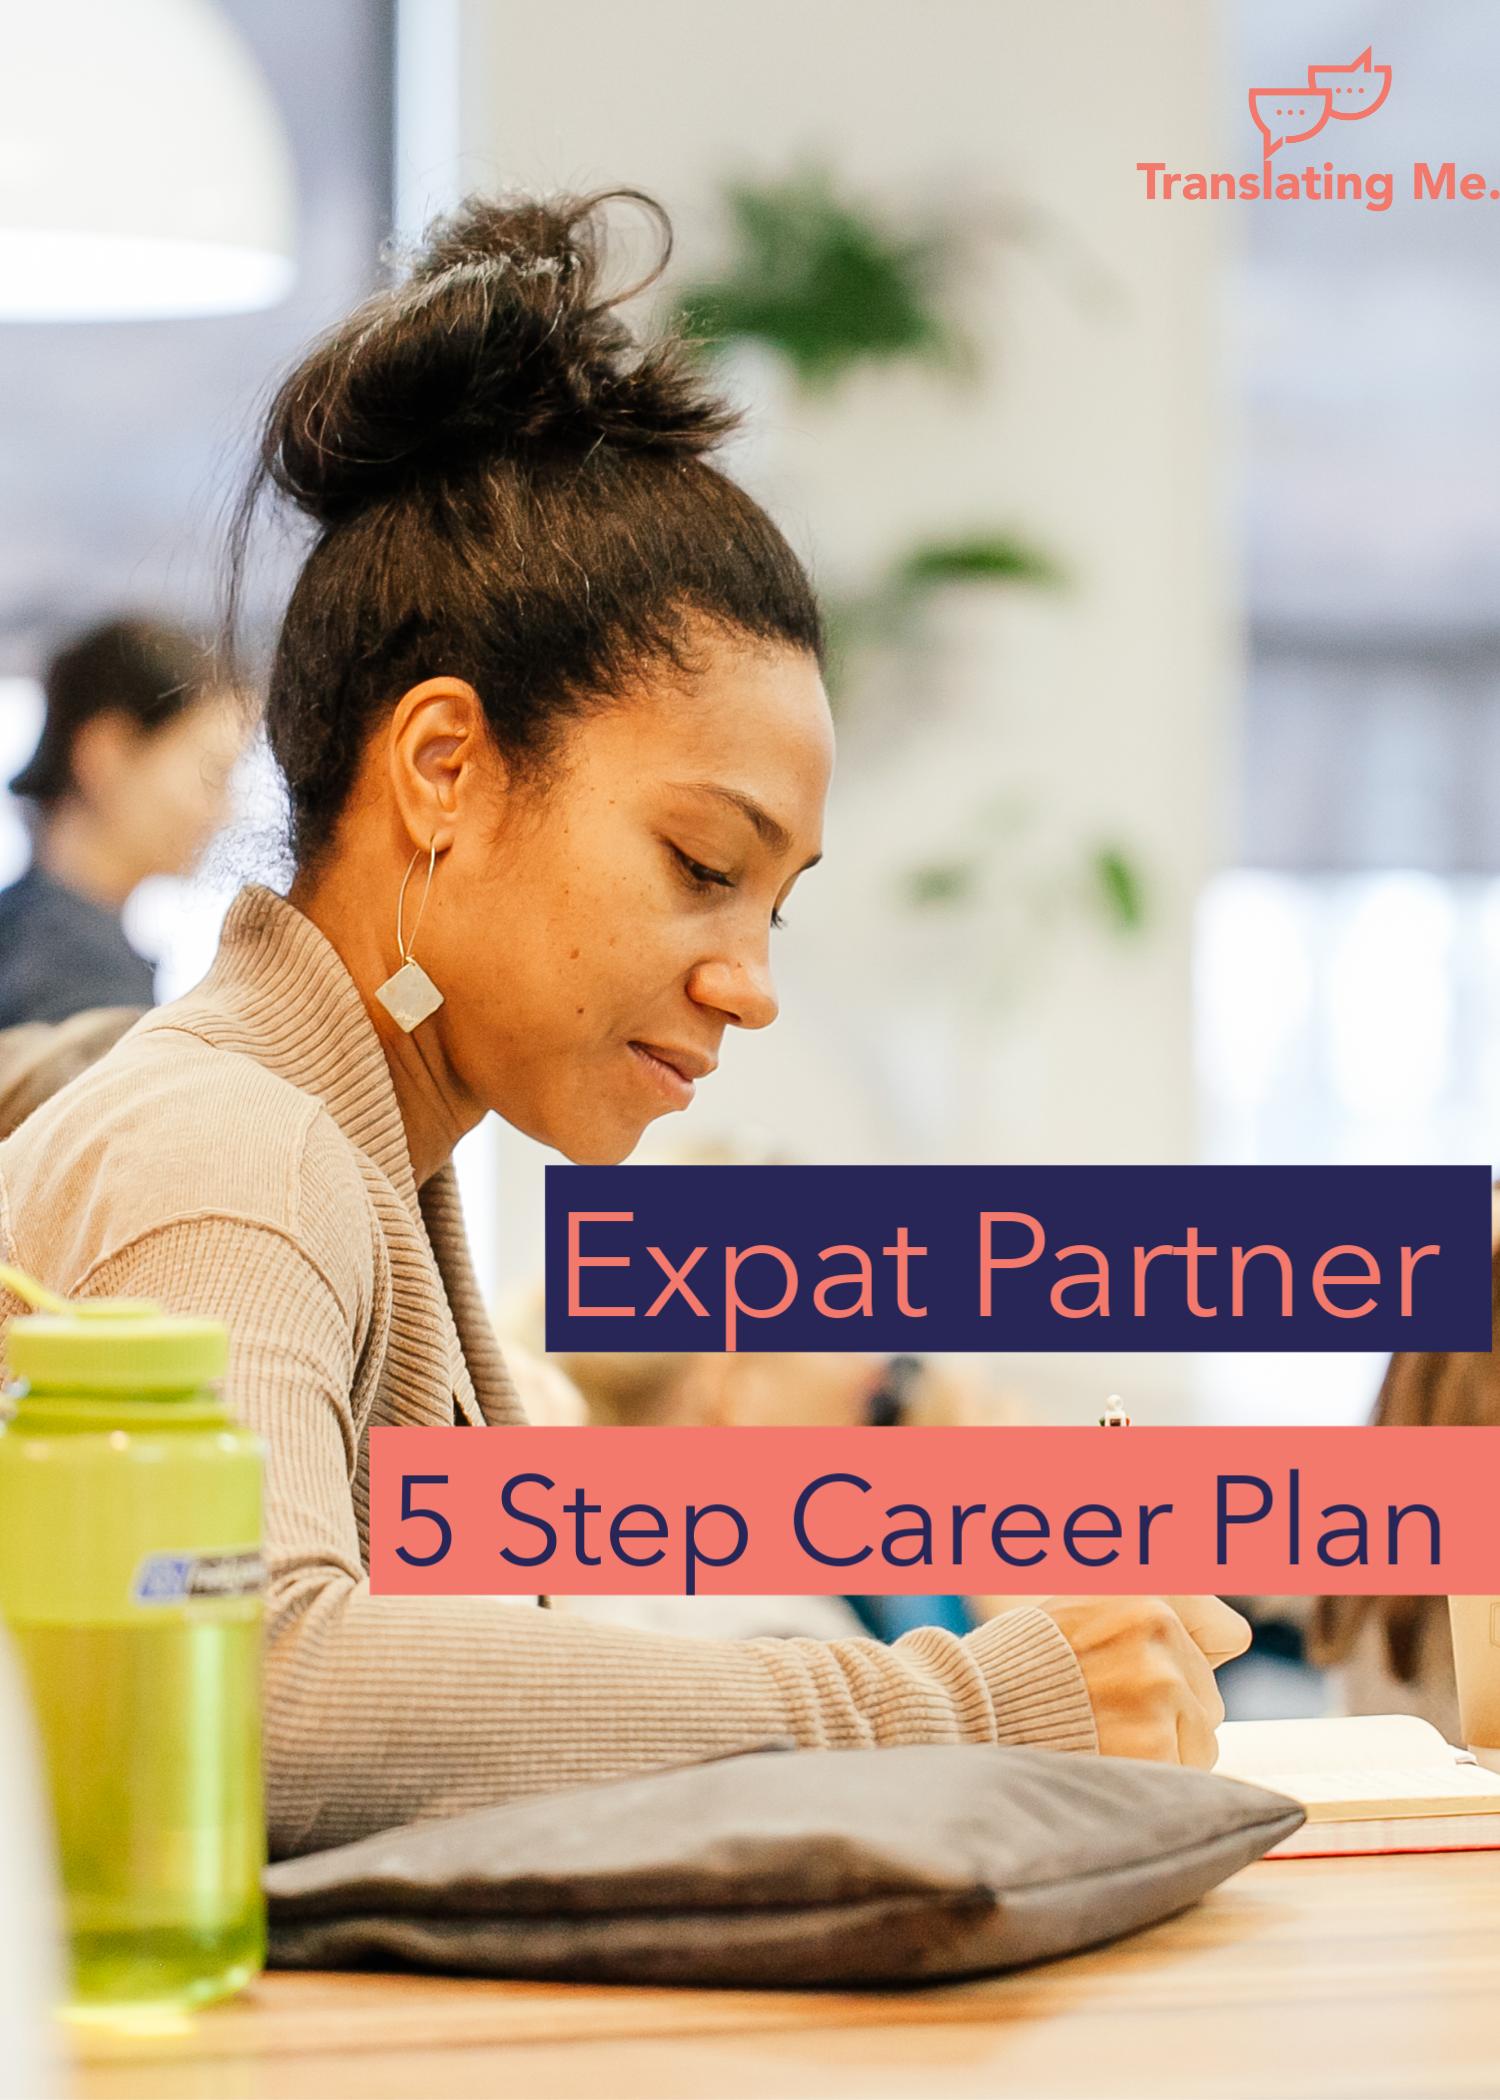 expat partner career